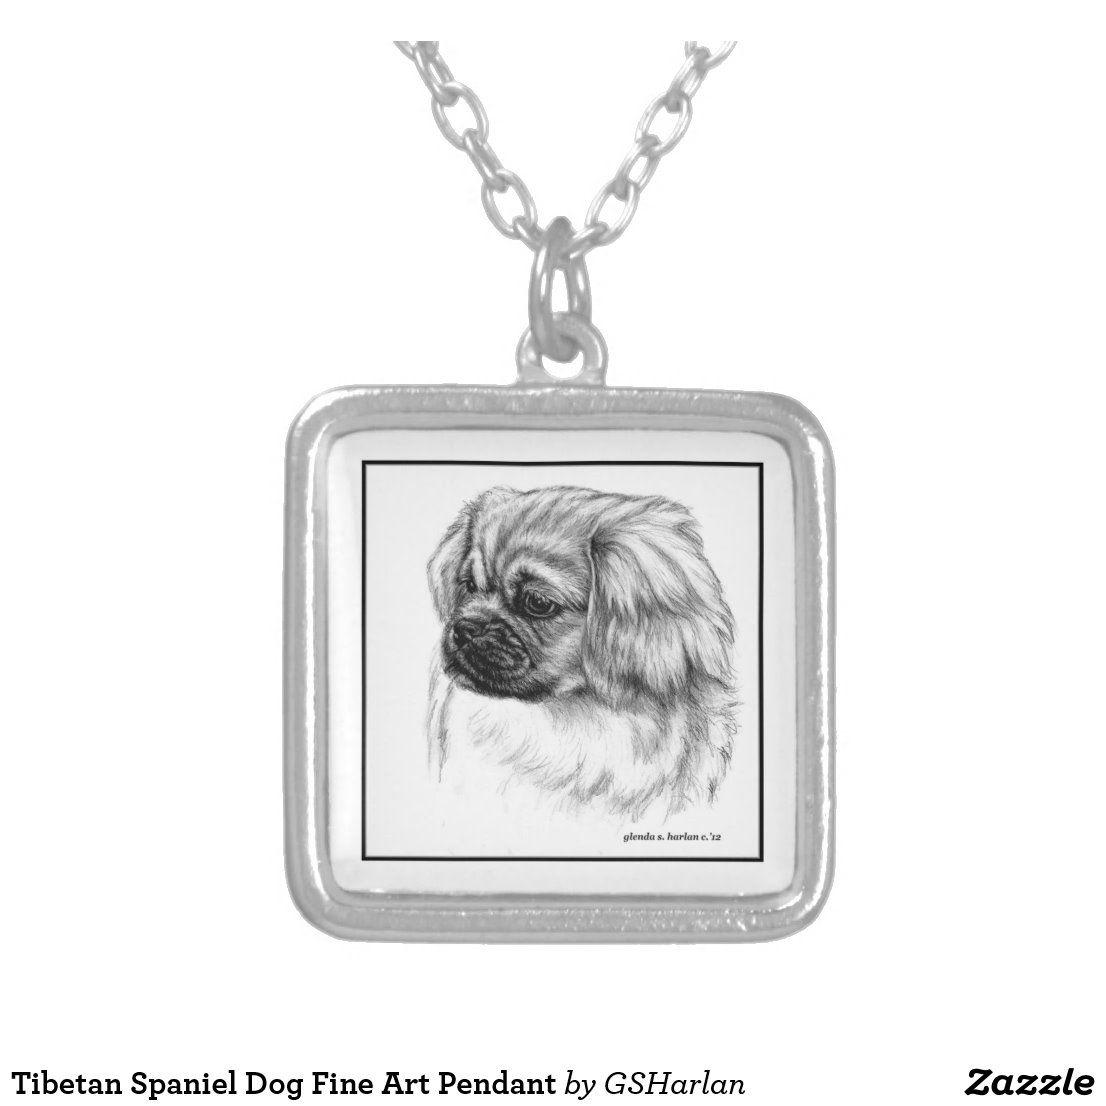 Tibetan Spaniel Dog Fine Art Pendant Zazzle Com Pendants Spaniel Dog Dog Jewelry